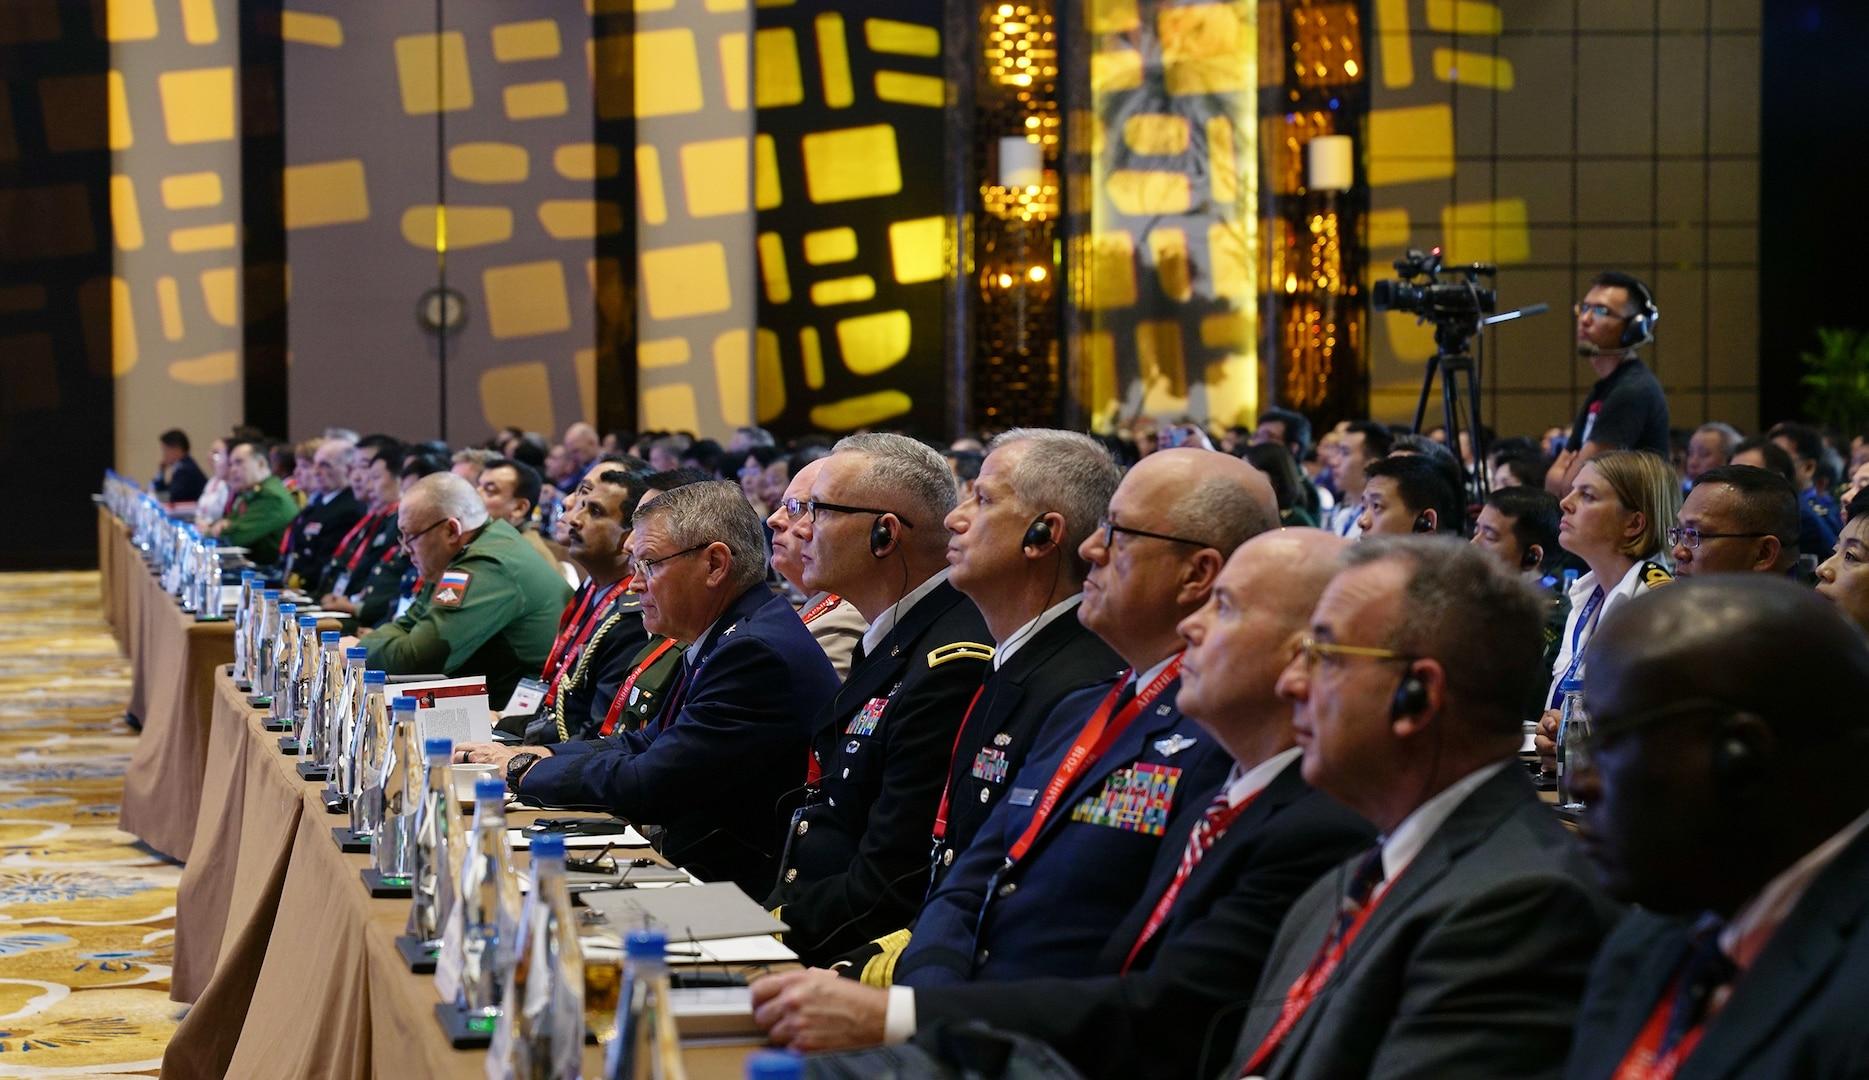 U.S., China Kick Off Multinational Asia Pacific Military Health Exchange 2018